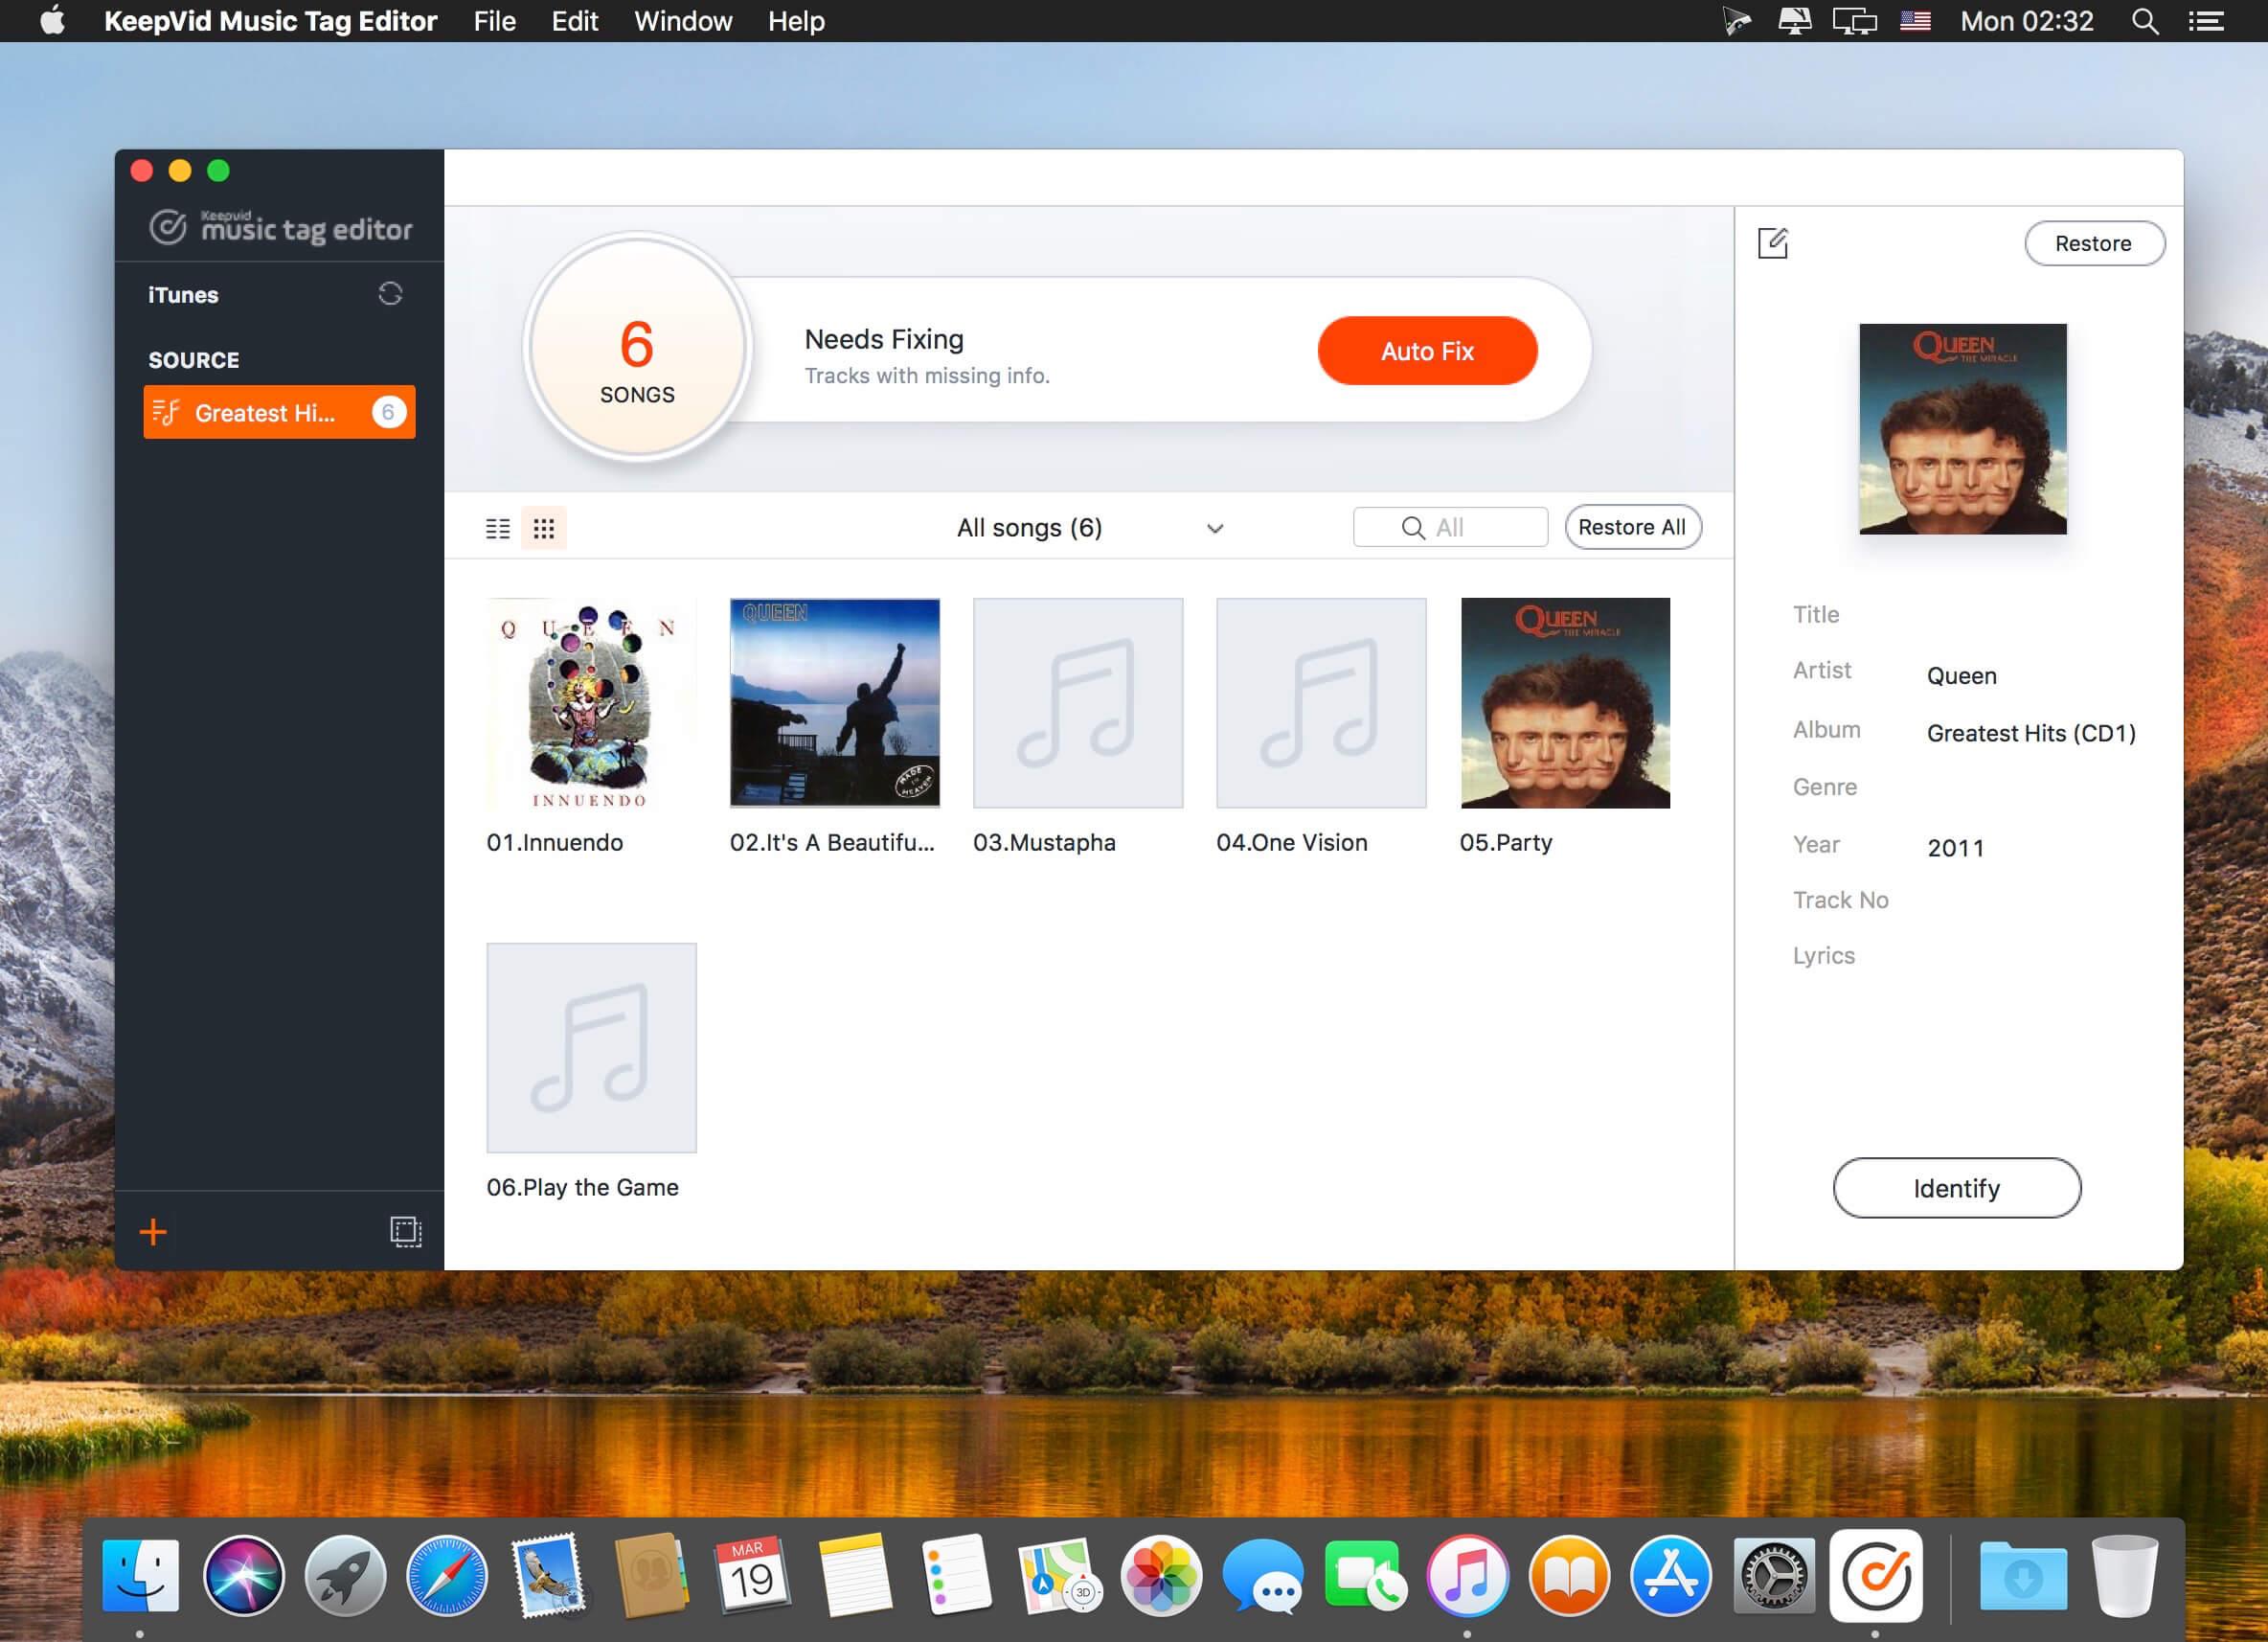 KeepVid Music Tag Editor 2 0 0 3 download | macOS